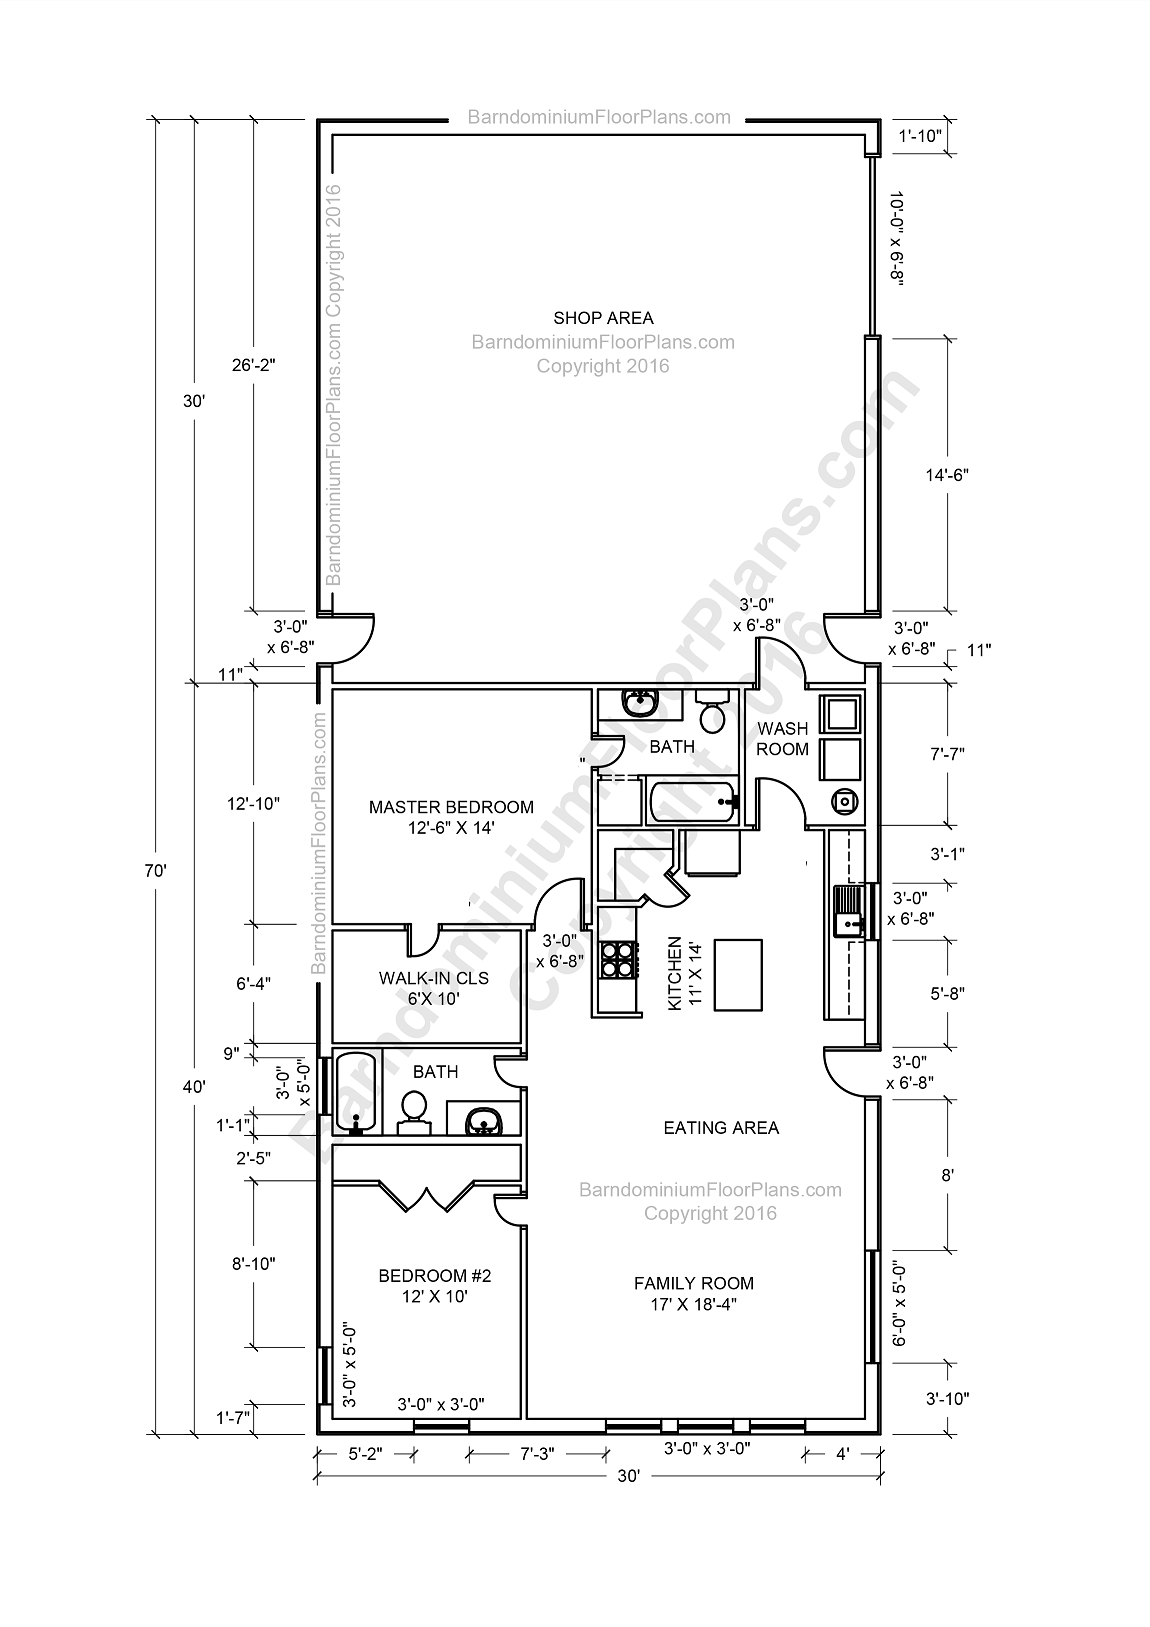 barndominium floor plans pole barn house plans and metal barn homes barndominium floor plans